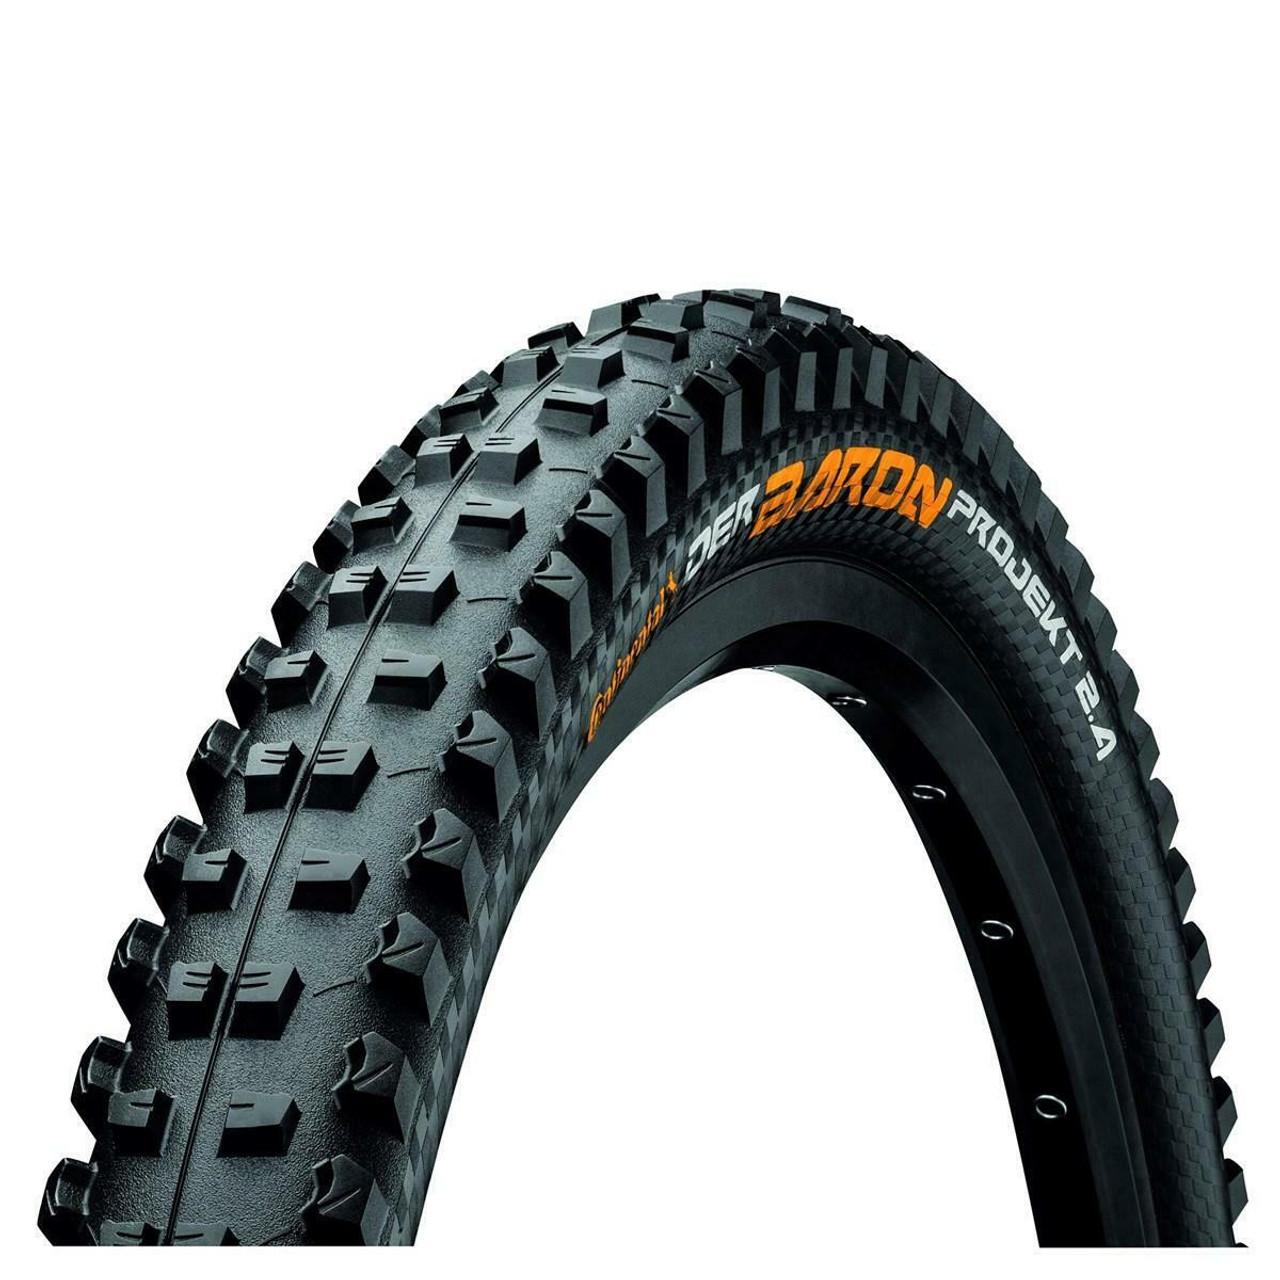 Continental Der Baron Projekt Protection Apex Tubeless Folding BlackChili Tyre